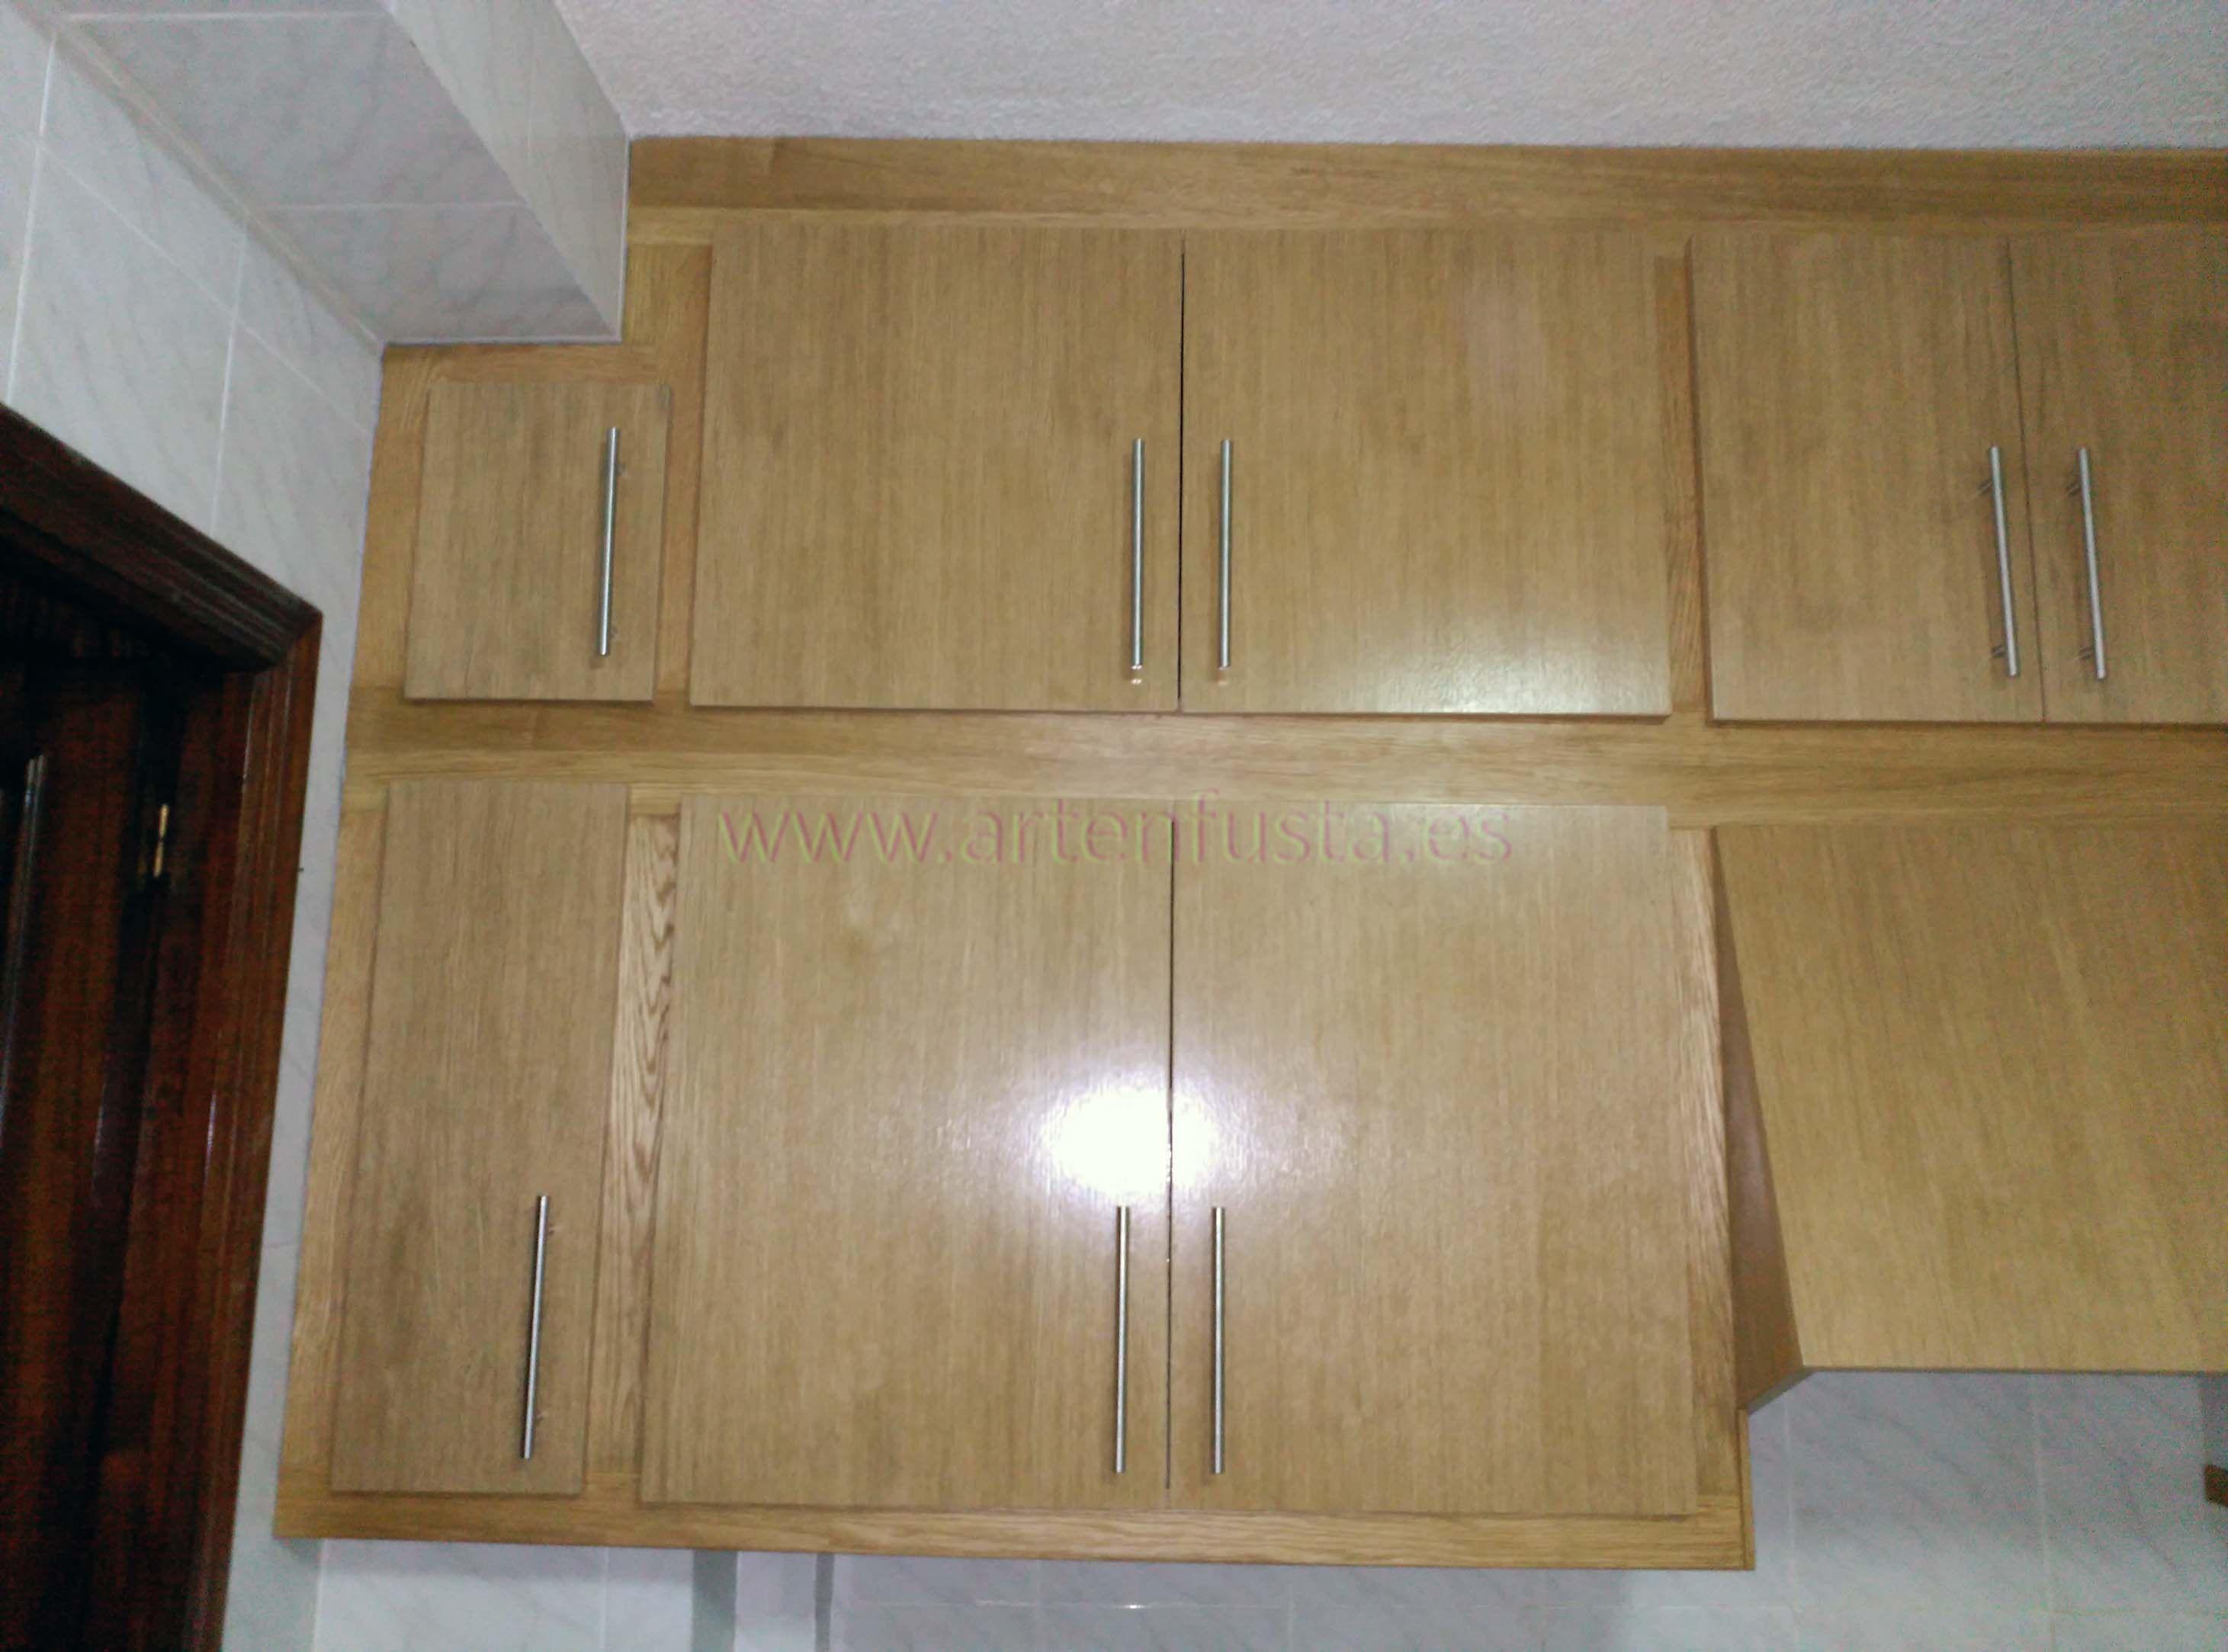 Muebles de cocina carpinteria j jimenez carpinter a a for Muebles anticrisis el castor alicante